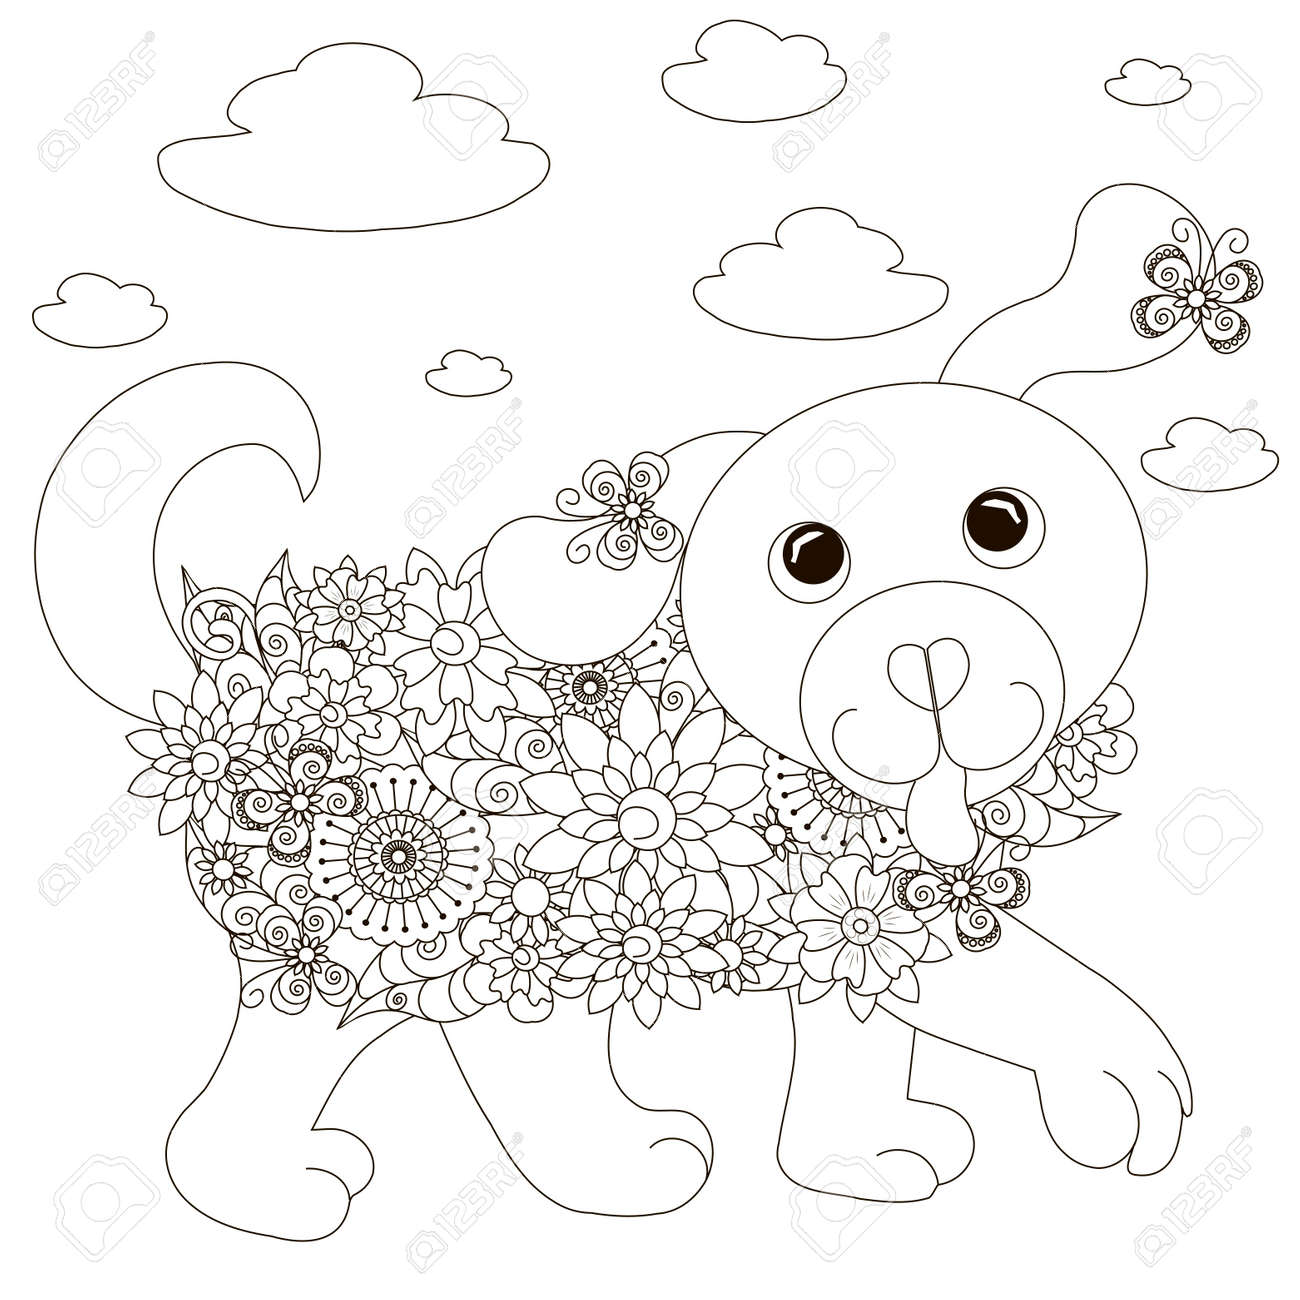 Coloriage Anti Stress Chien.Fleurs Chien Coloriage Anti Stress Vector Illustration Stock Clip